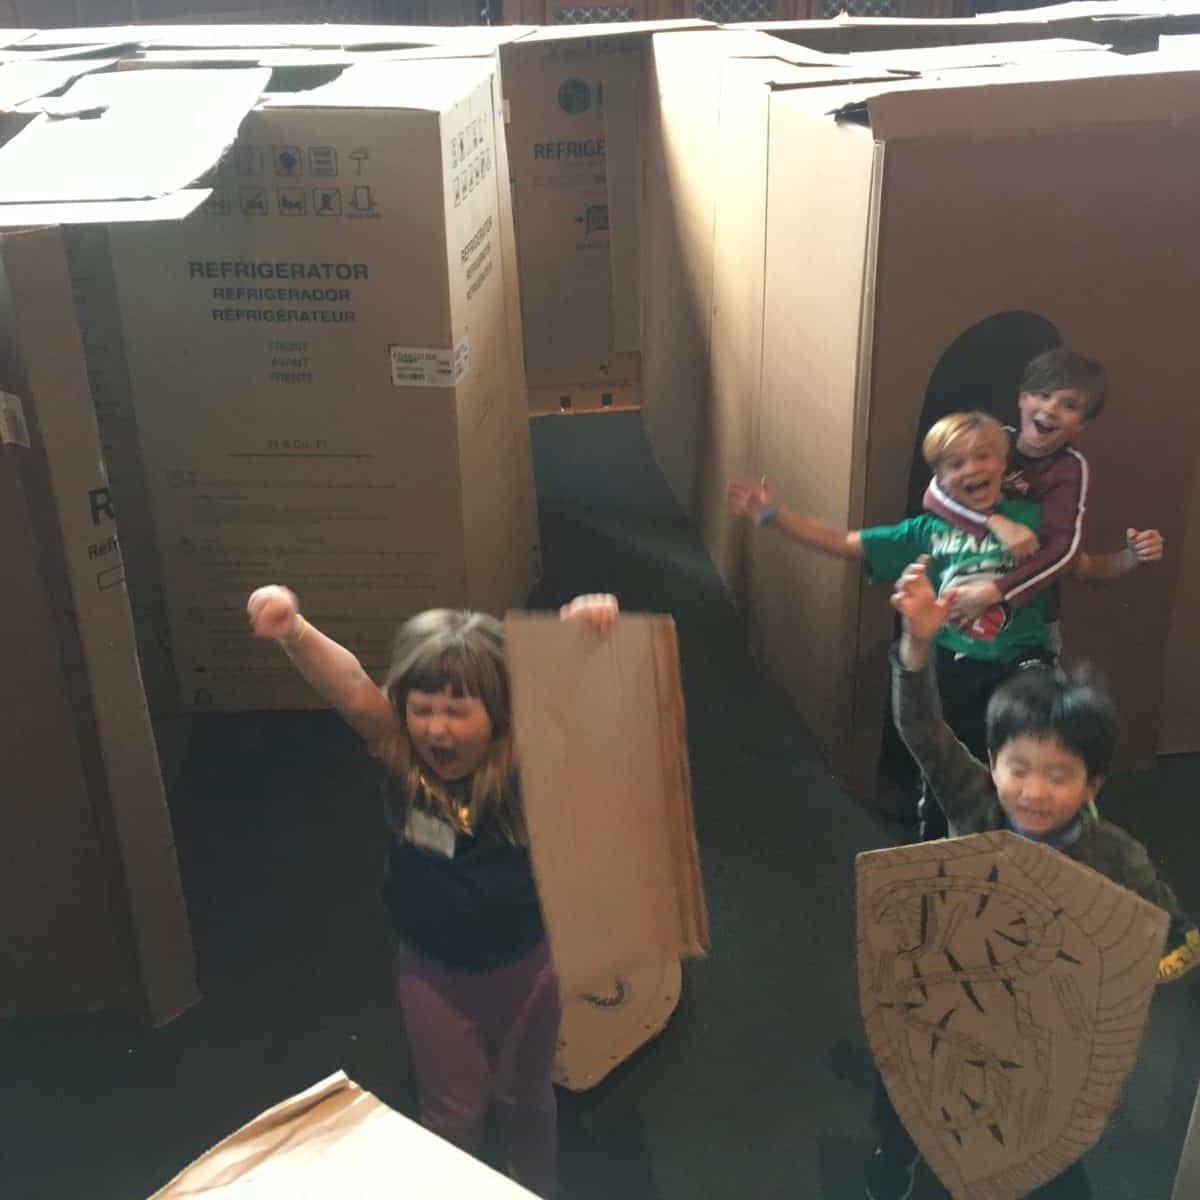 Kids and Cardboard 2138